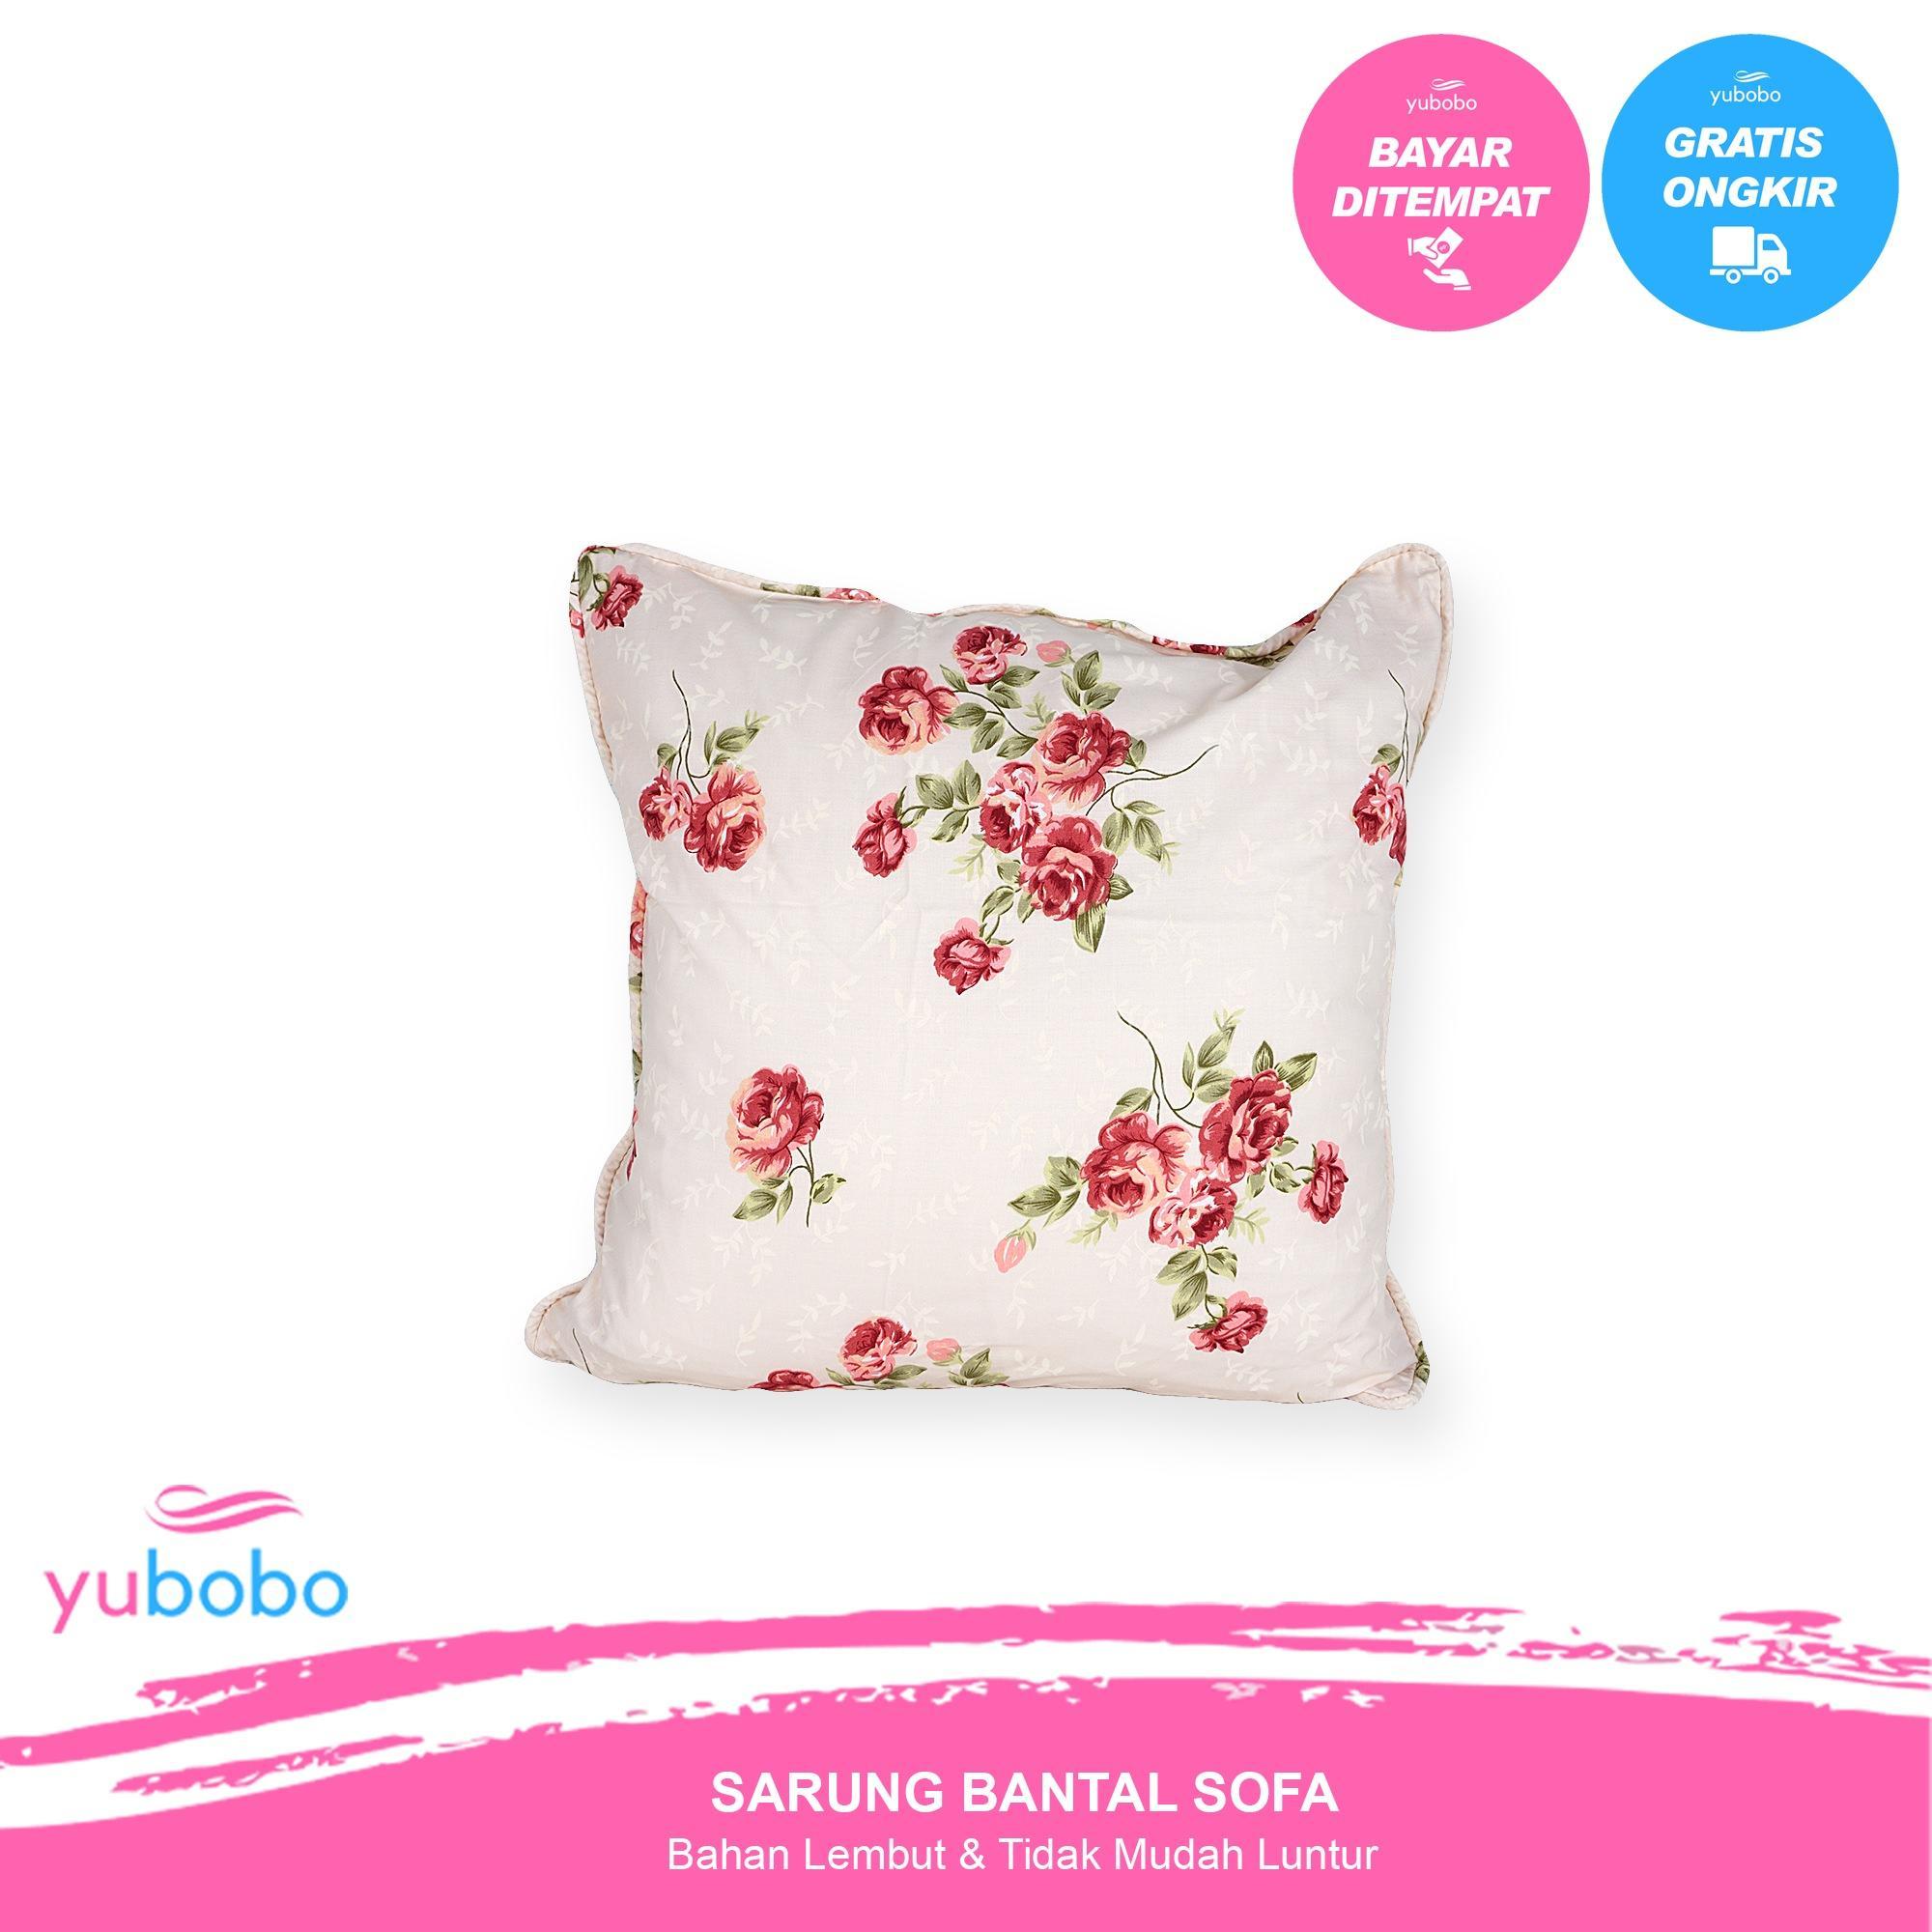 Yubobo - Sarung Bantal Sofa  / Kursi Tamu Promo (Hanya Sarung) Bahan Katun Jepang